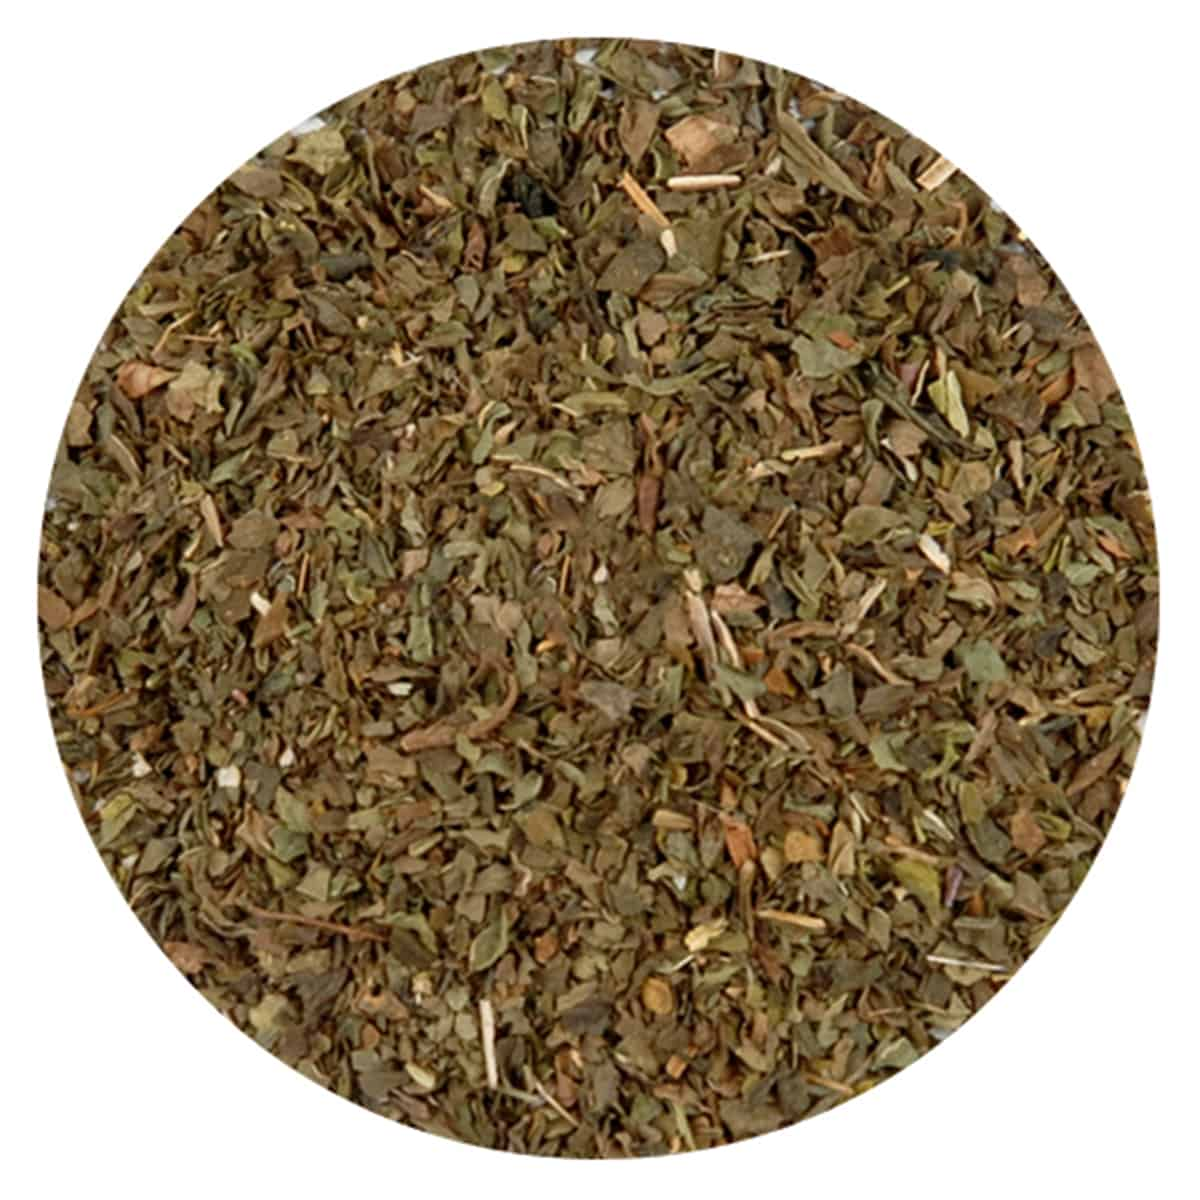 Buy IAG Foods Dried Spearmint Leaves - 1 kg